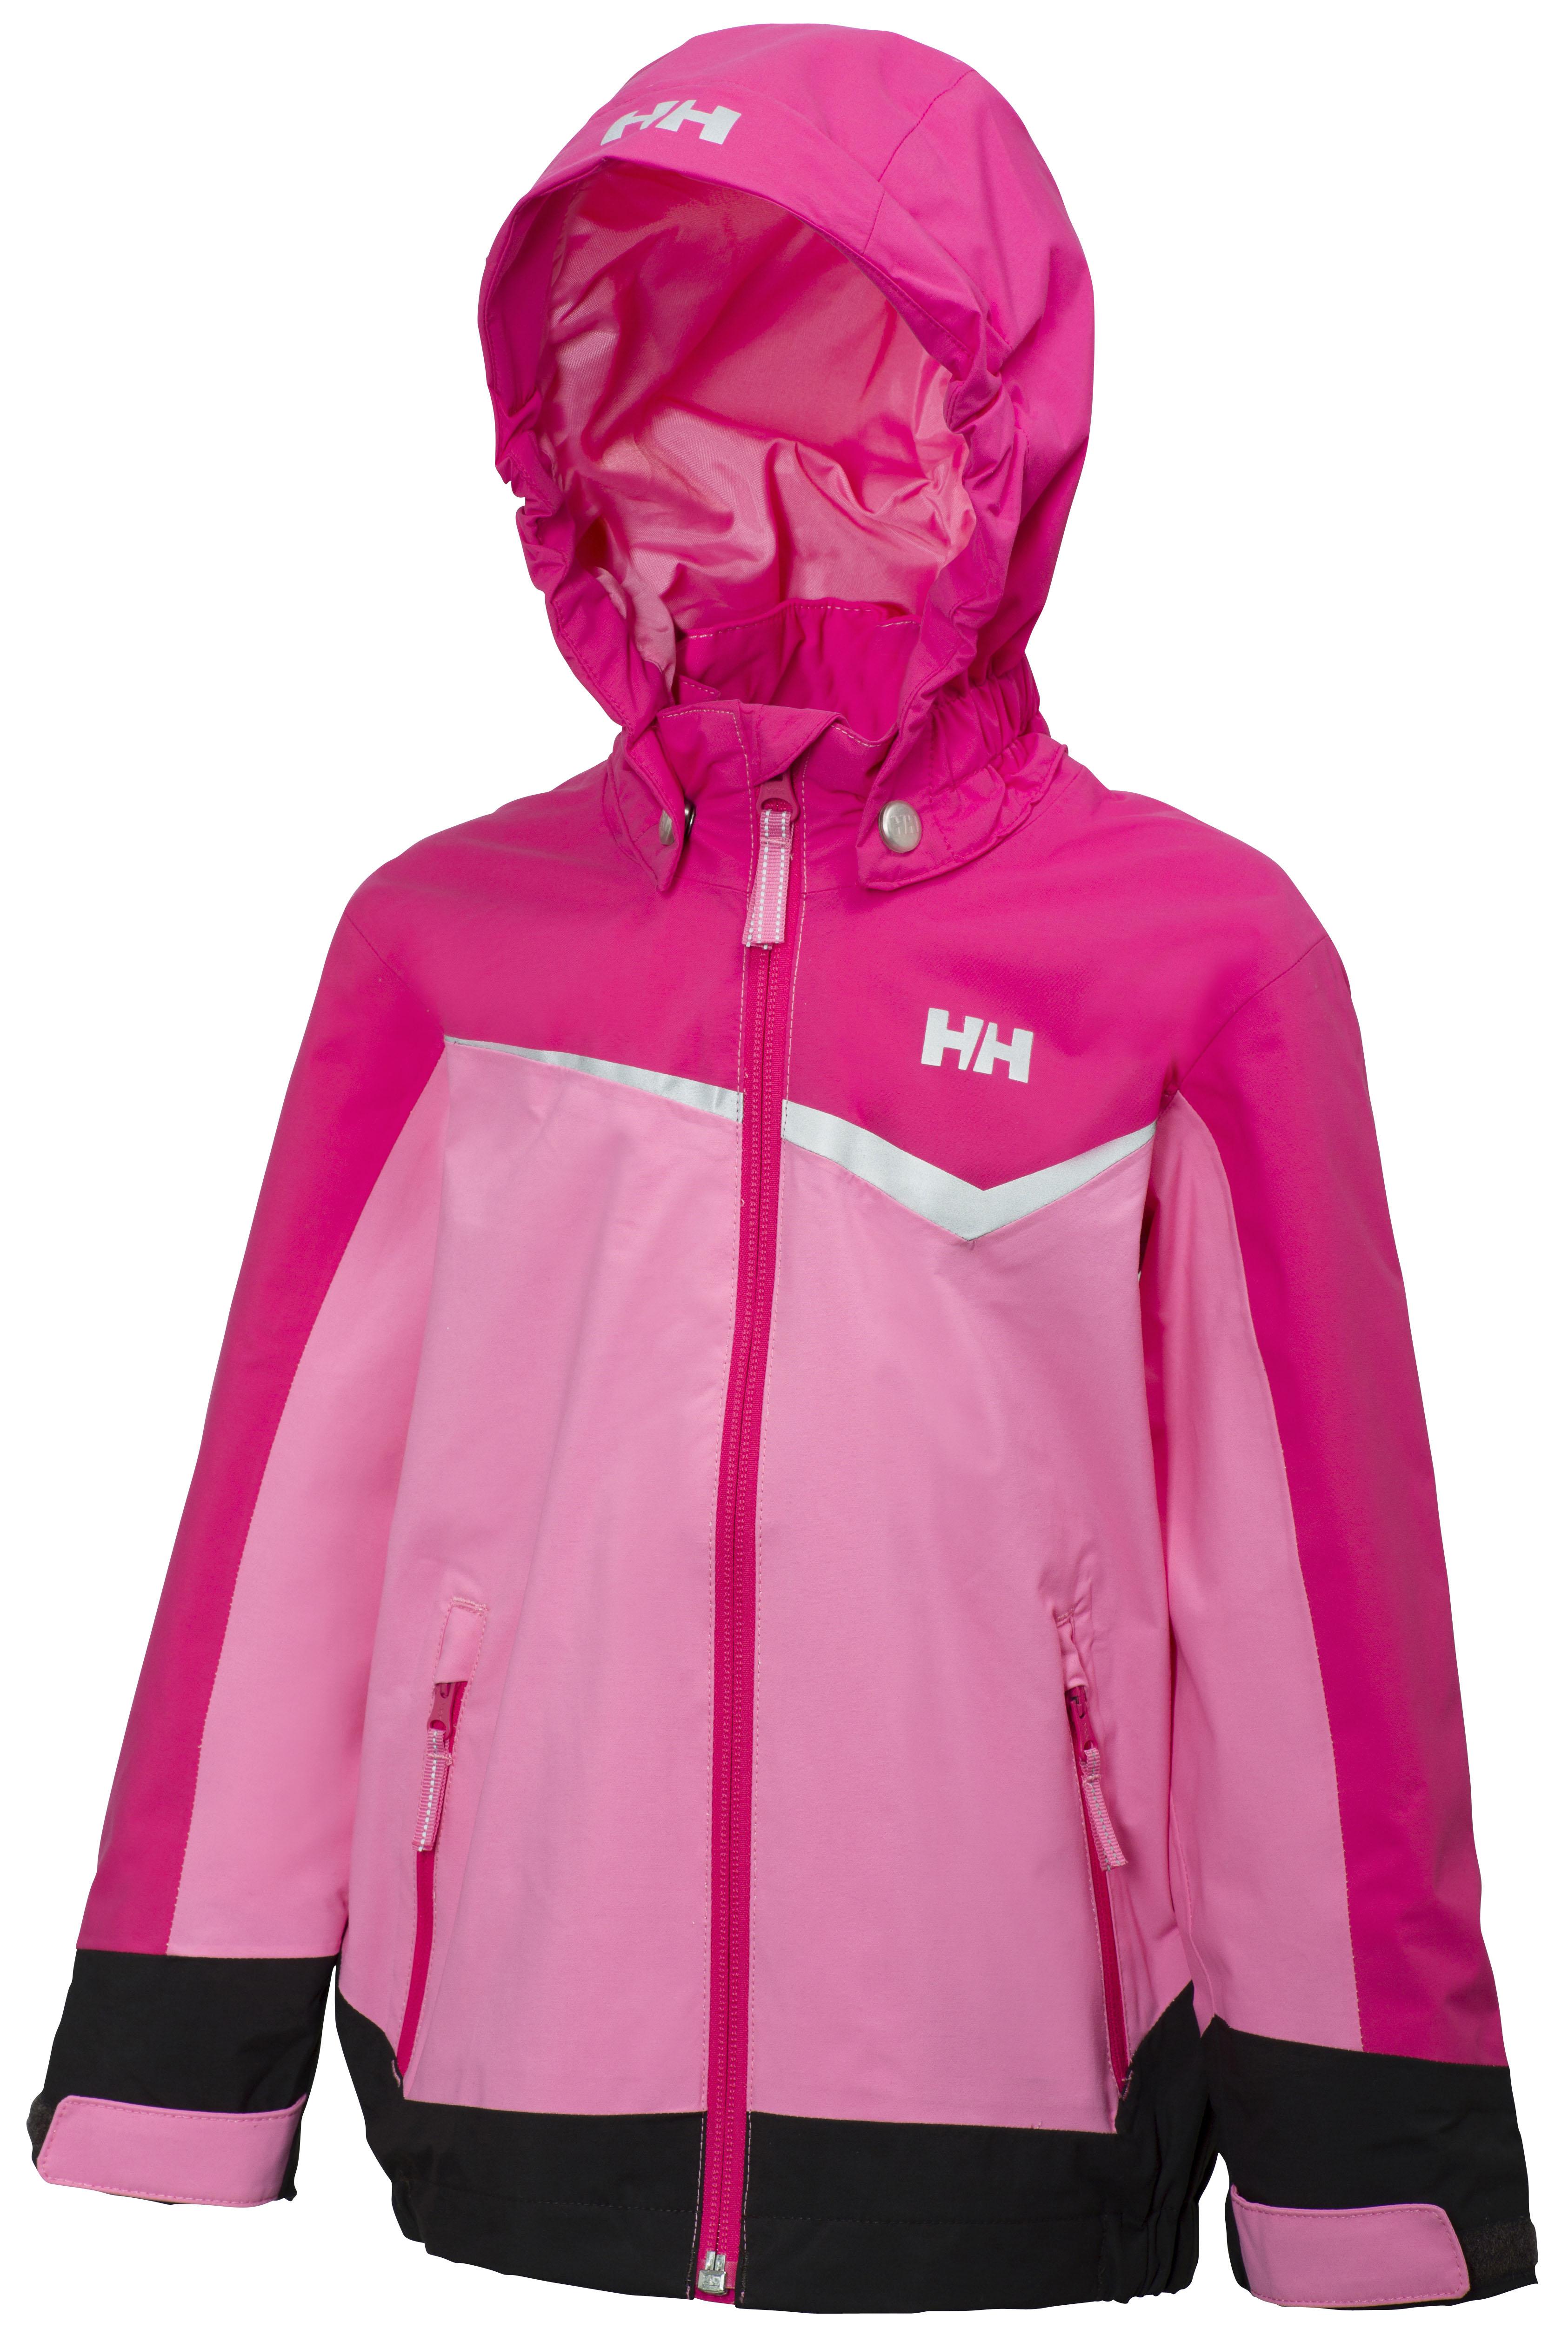 uk availability 9f2a5 e9dd0 Helly Hansen transition jacket children